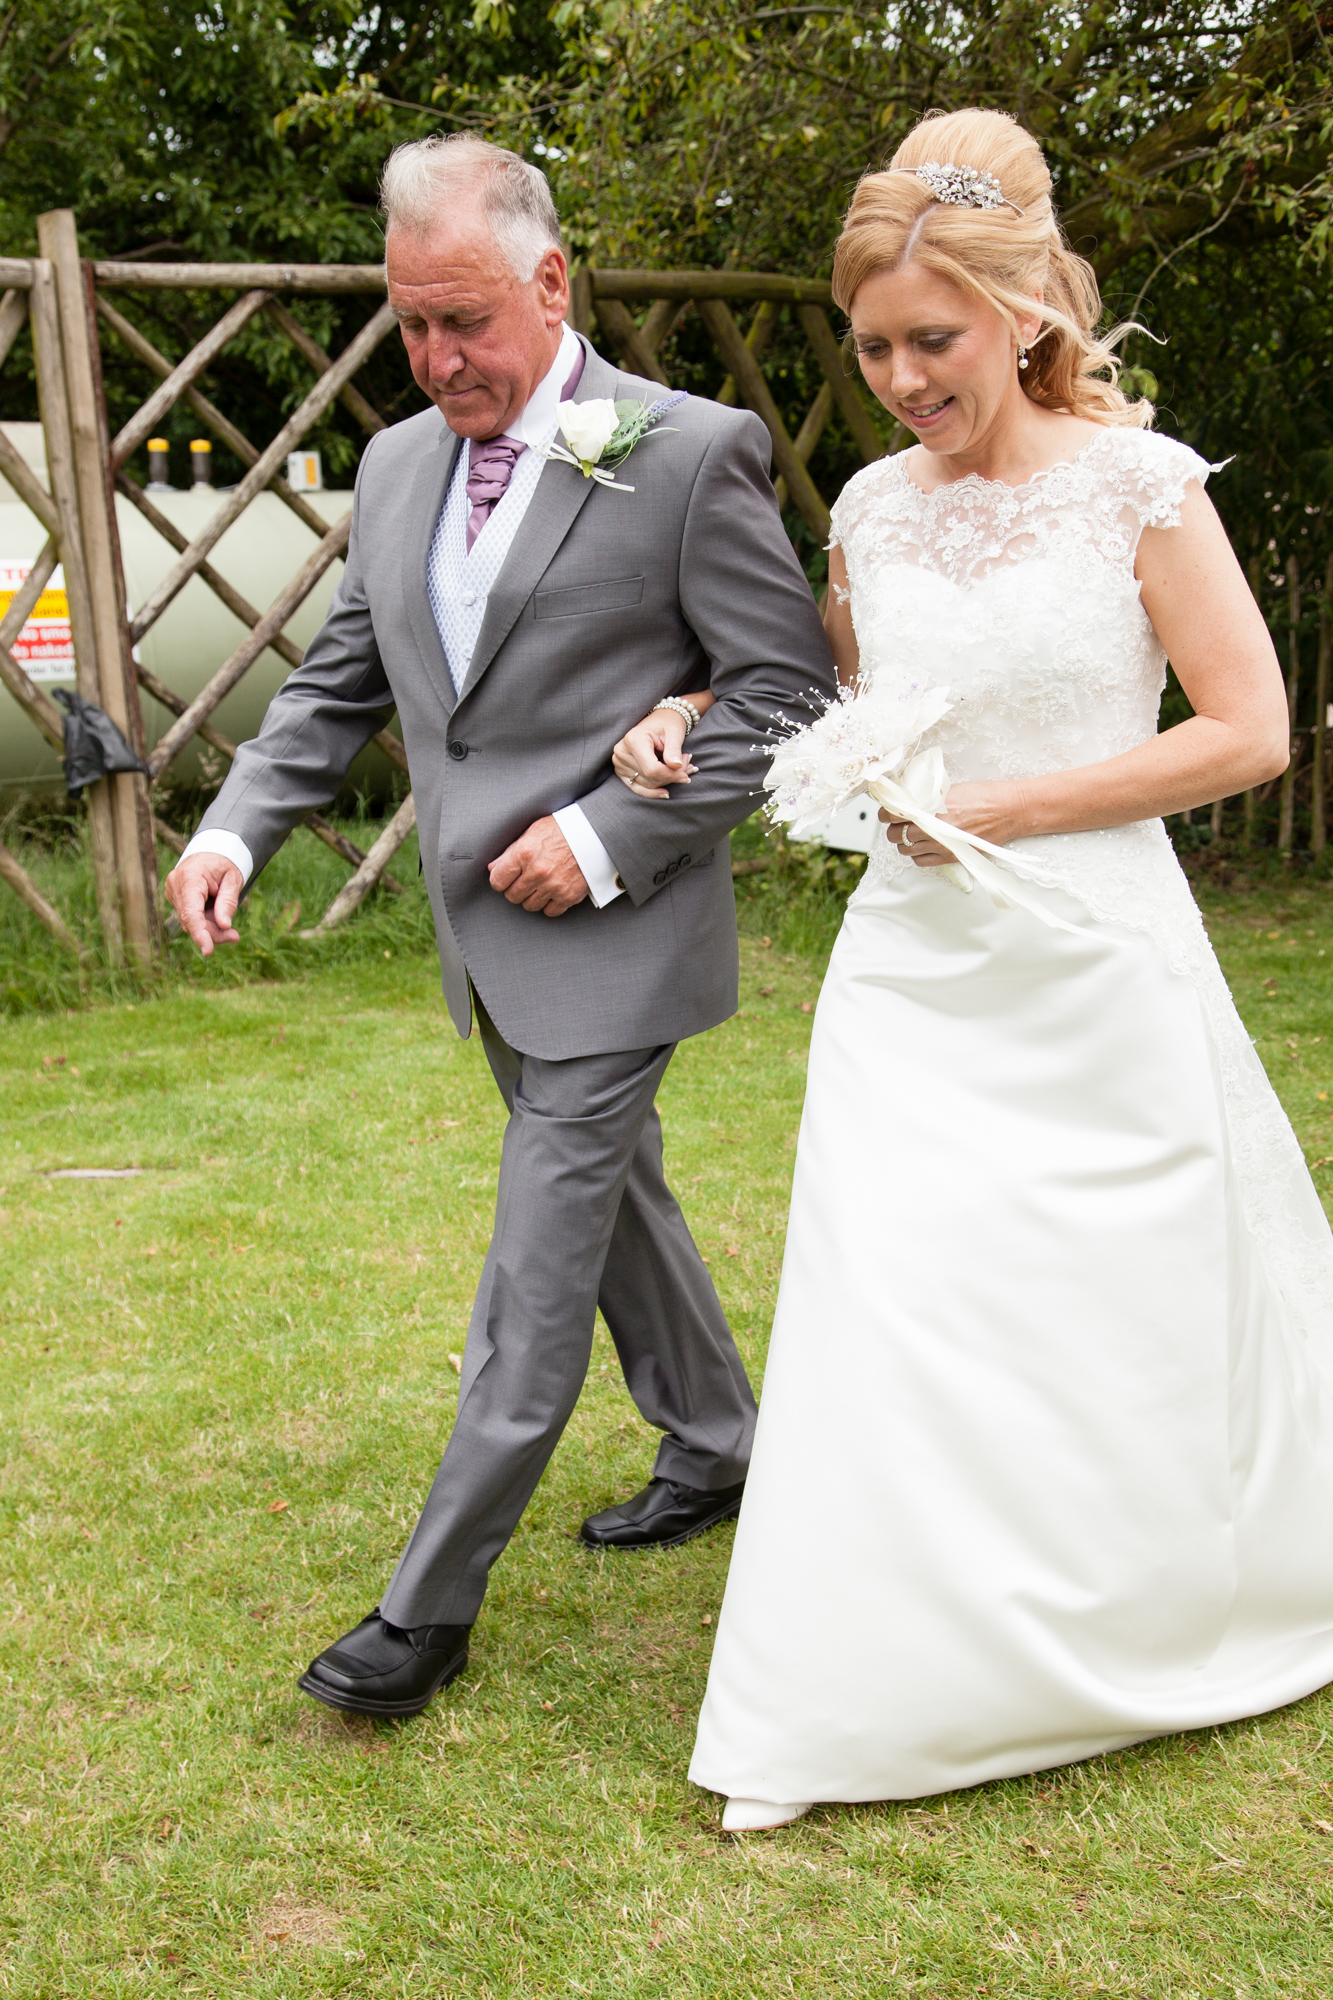 110715_LisaCraigJohnson_Wedding_5595187_WebWM.jpg